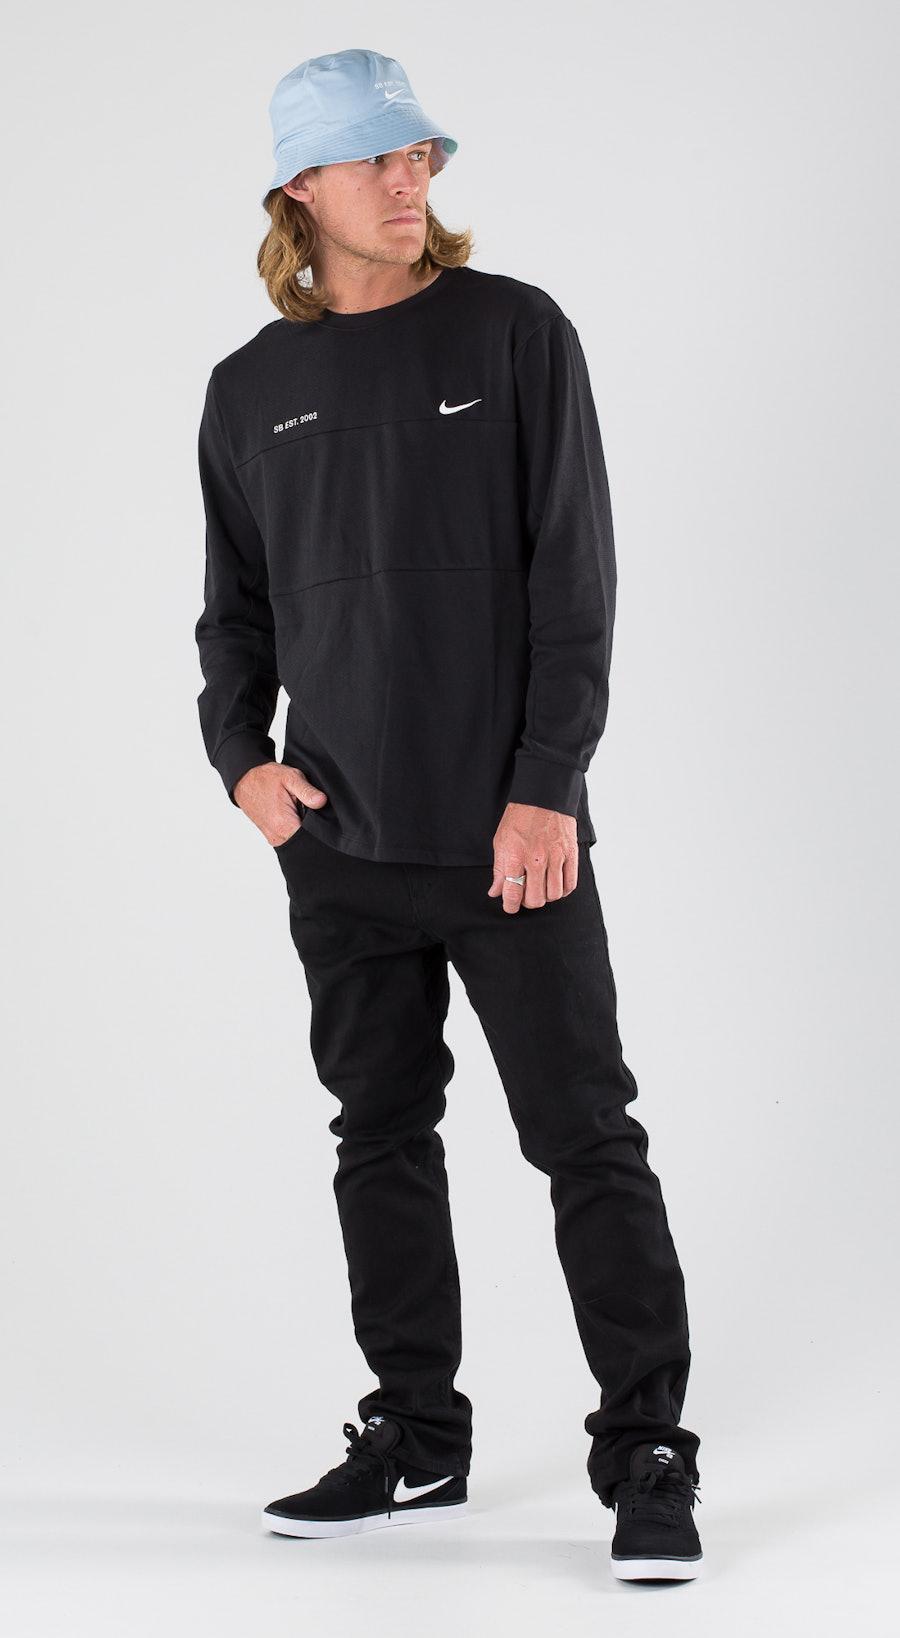 Nike SB Top Mesh Black/White Outfit Multi